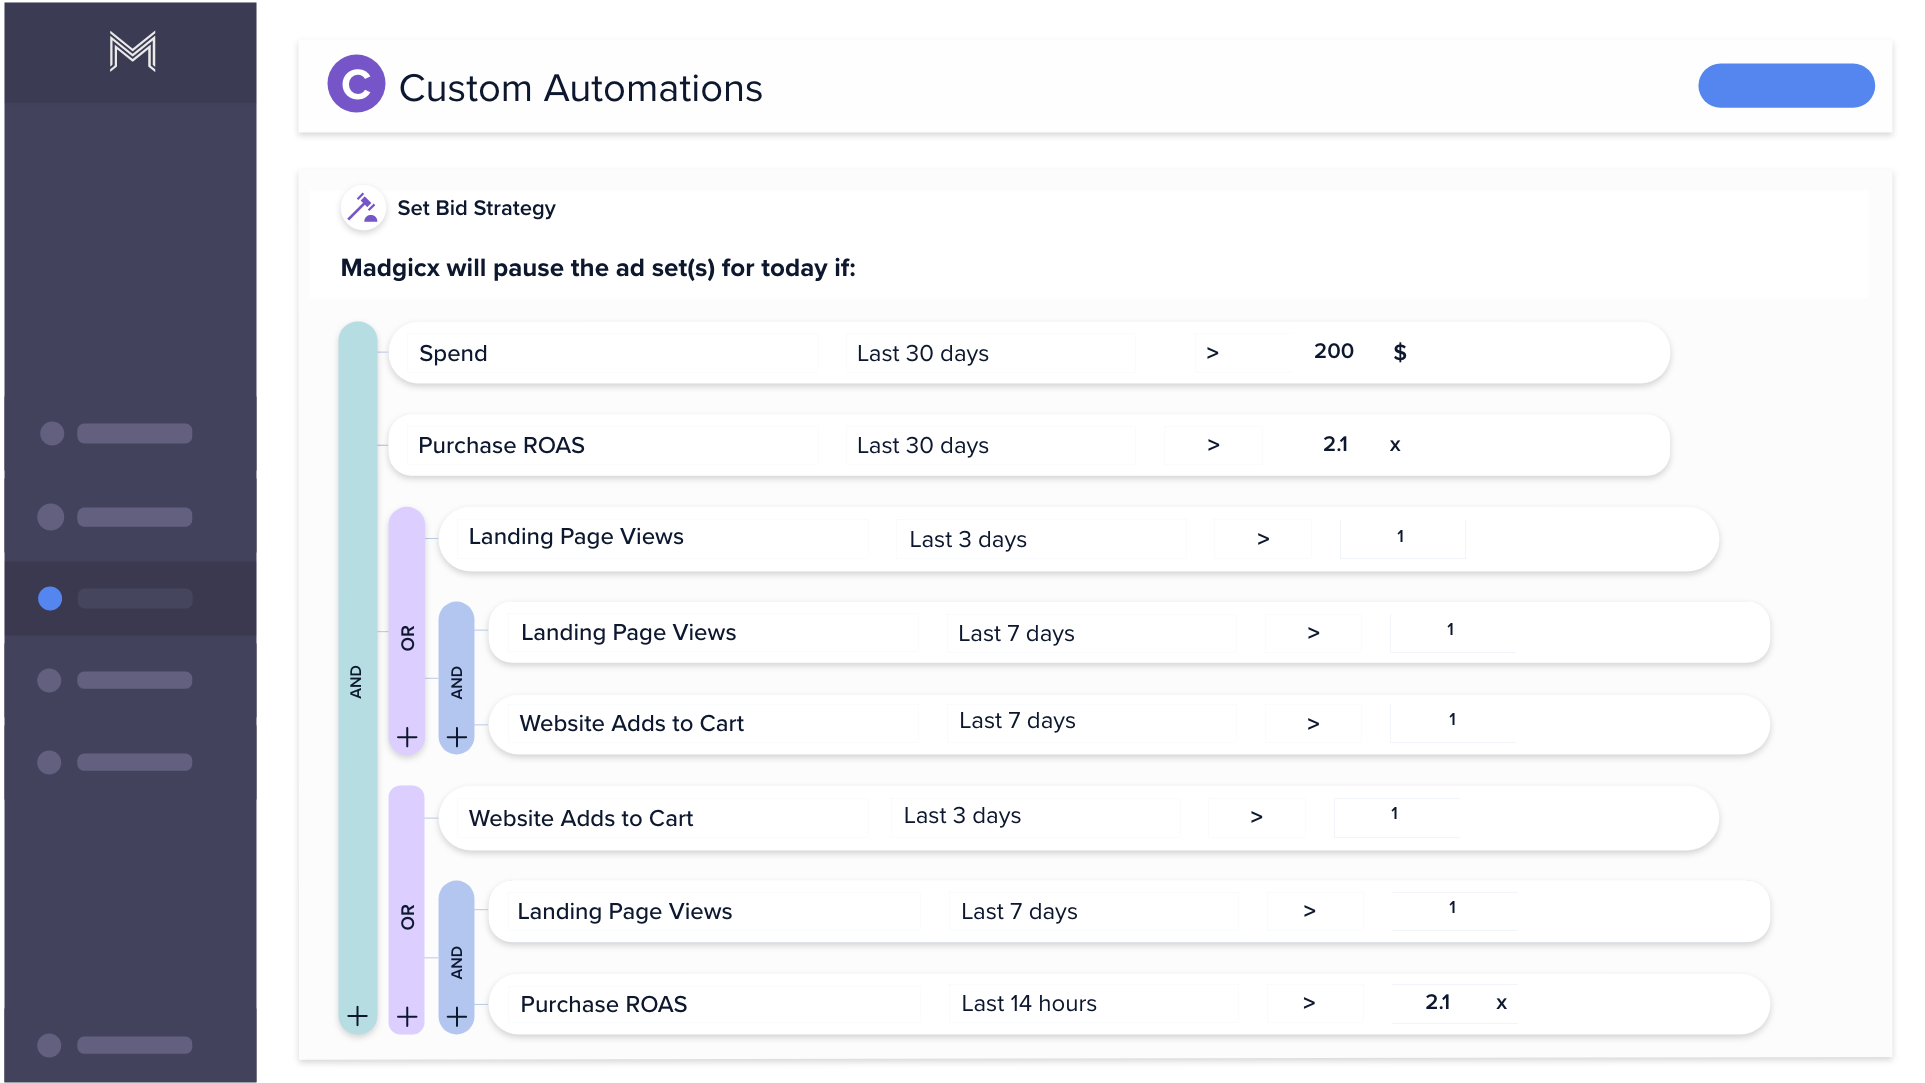 Madgicx custom automations